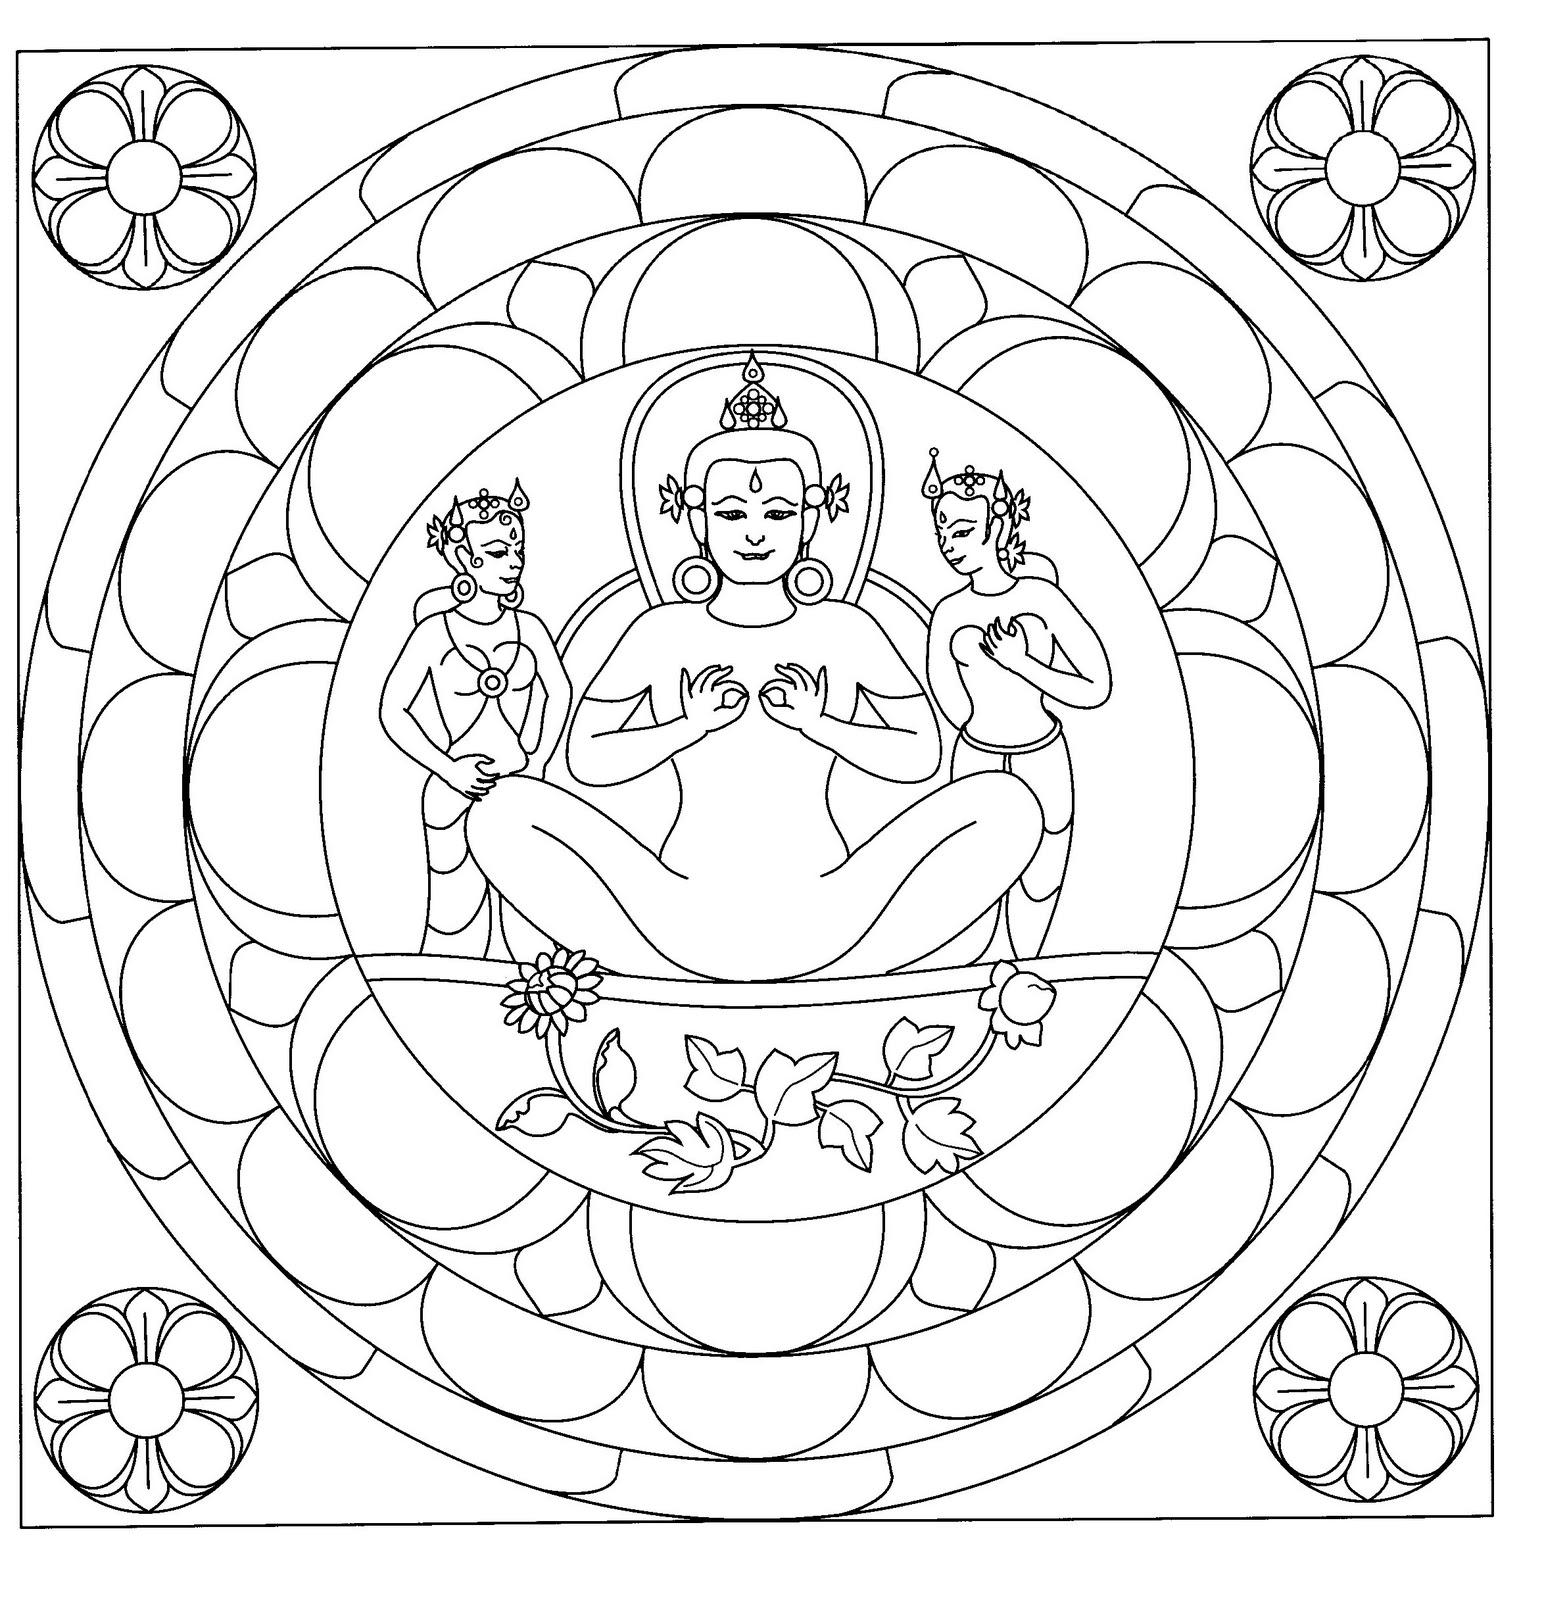 Mandalas Para Pintar: Diosa de la paz interior